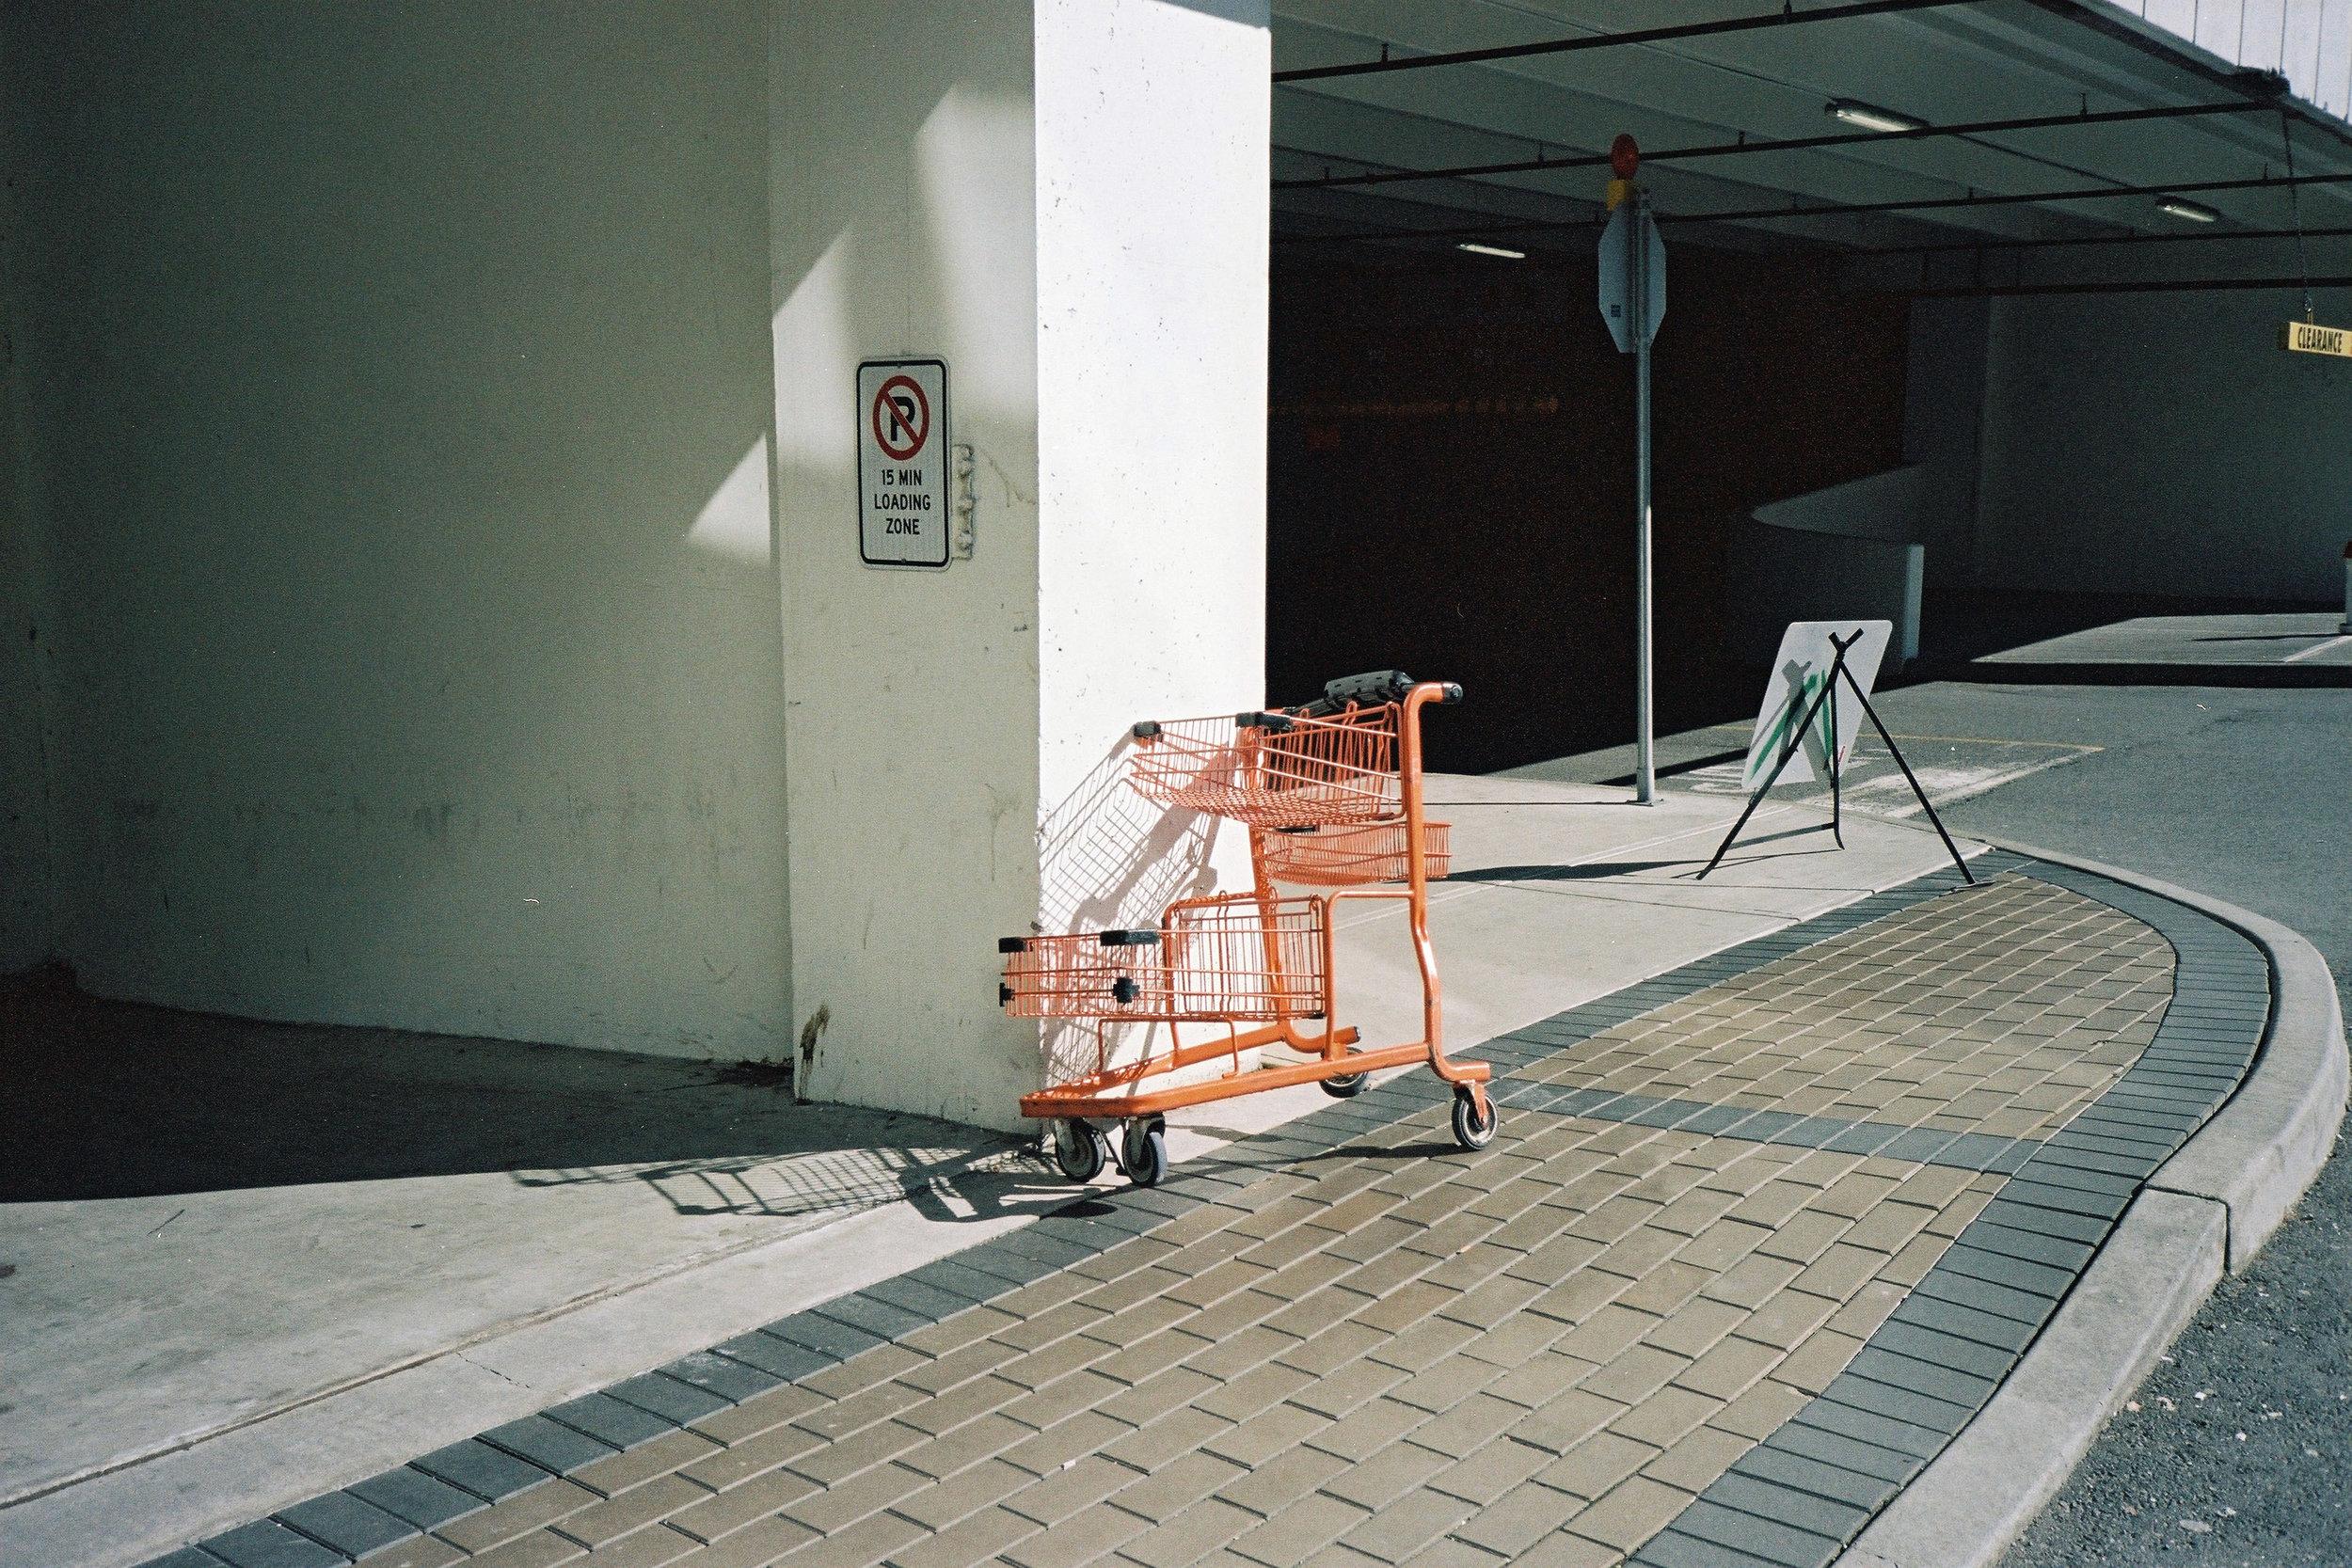 An empty trolley, West Vancouver © Tanya Clarke 2018